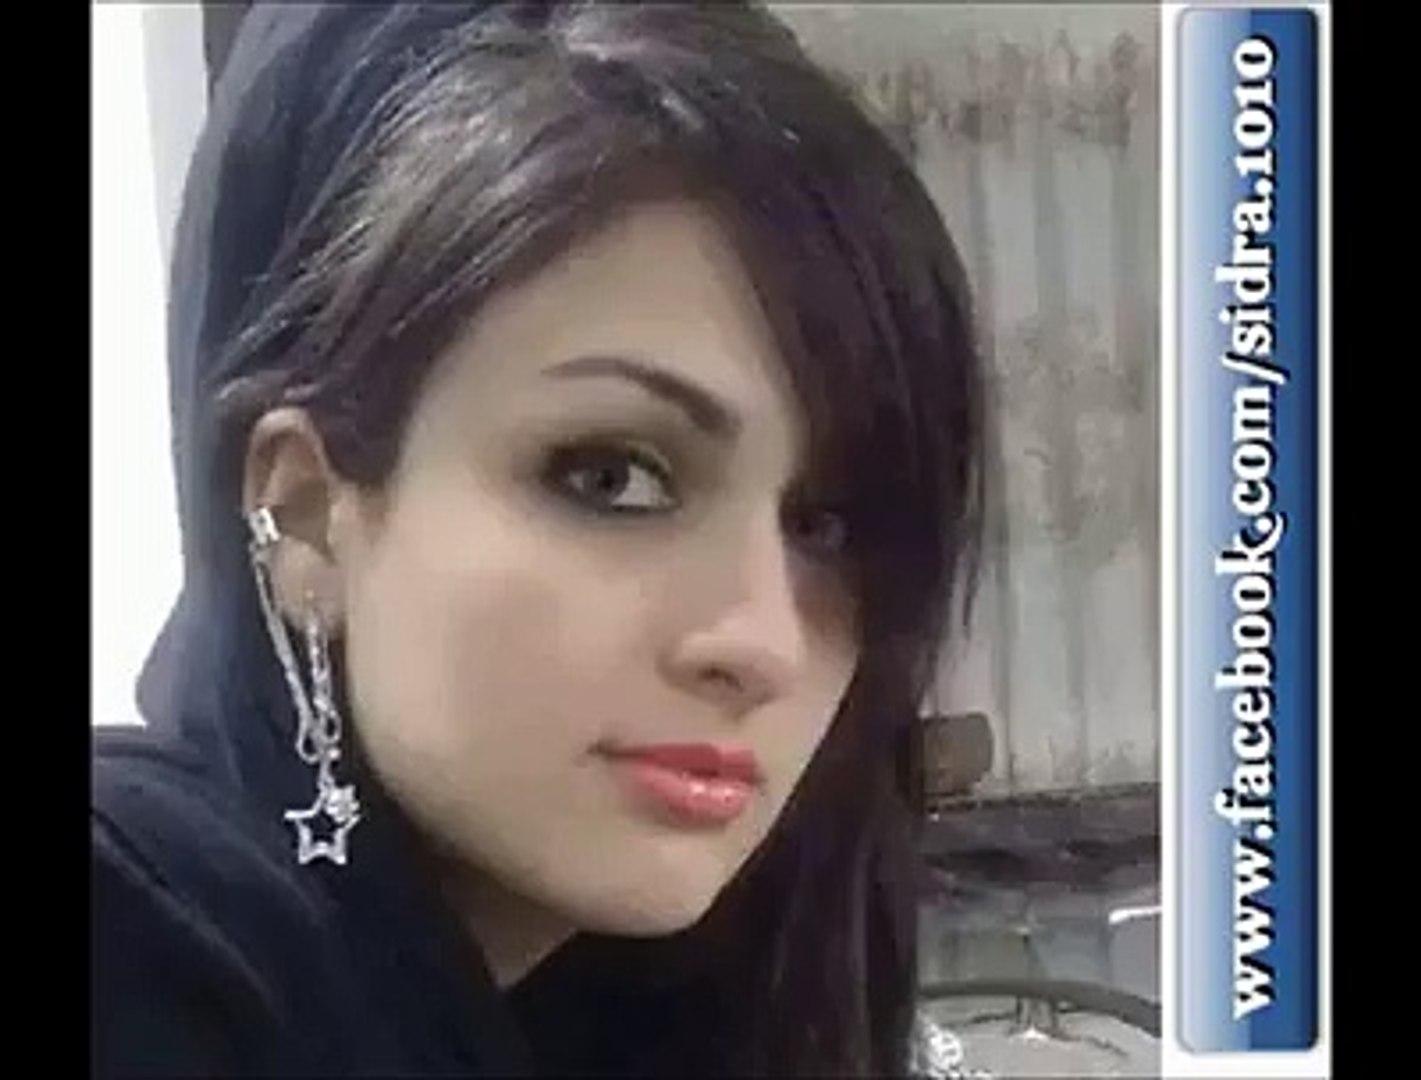 A Pathan Call to OLX Maekrting Girl   Very Very Funny Video